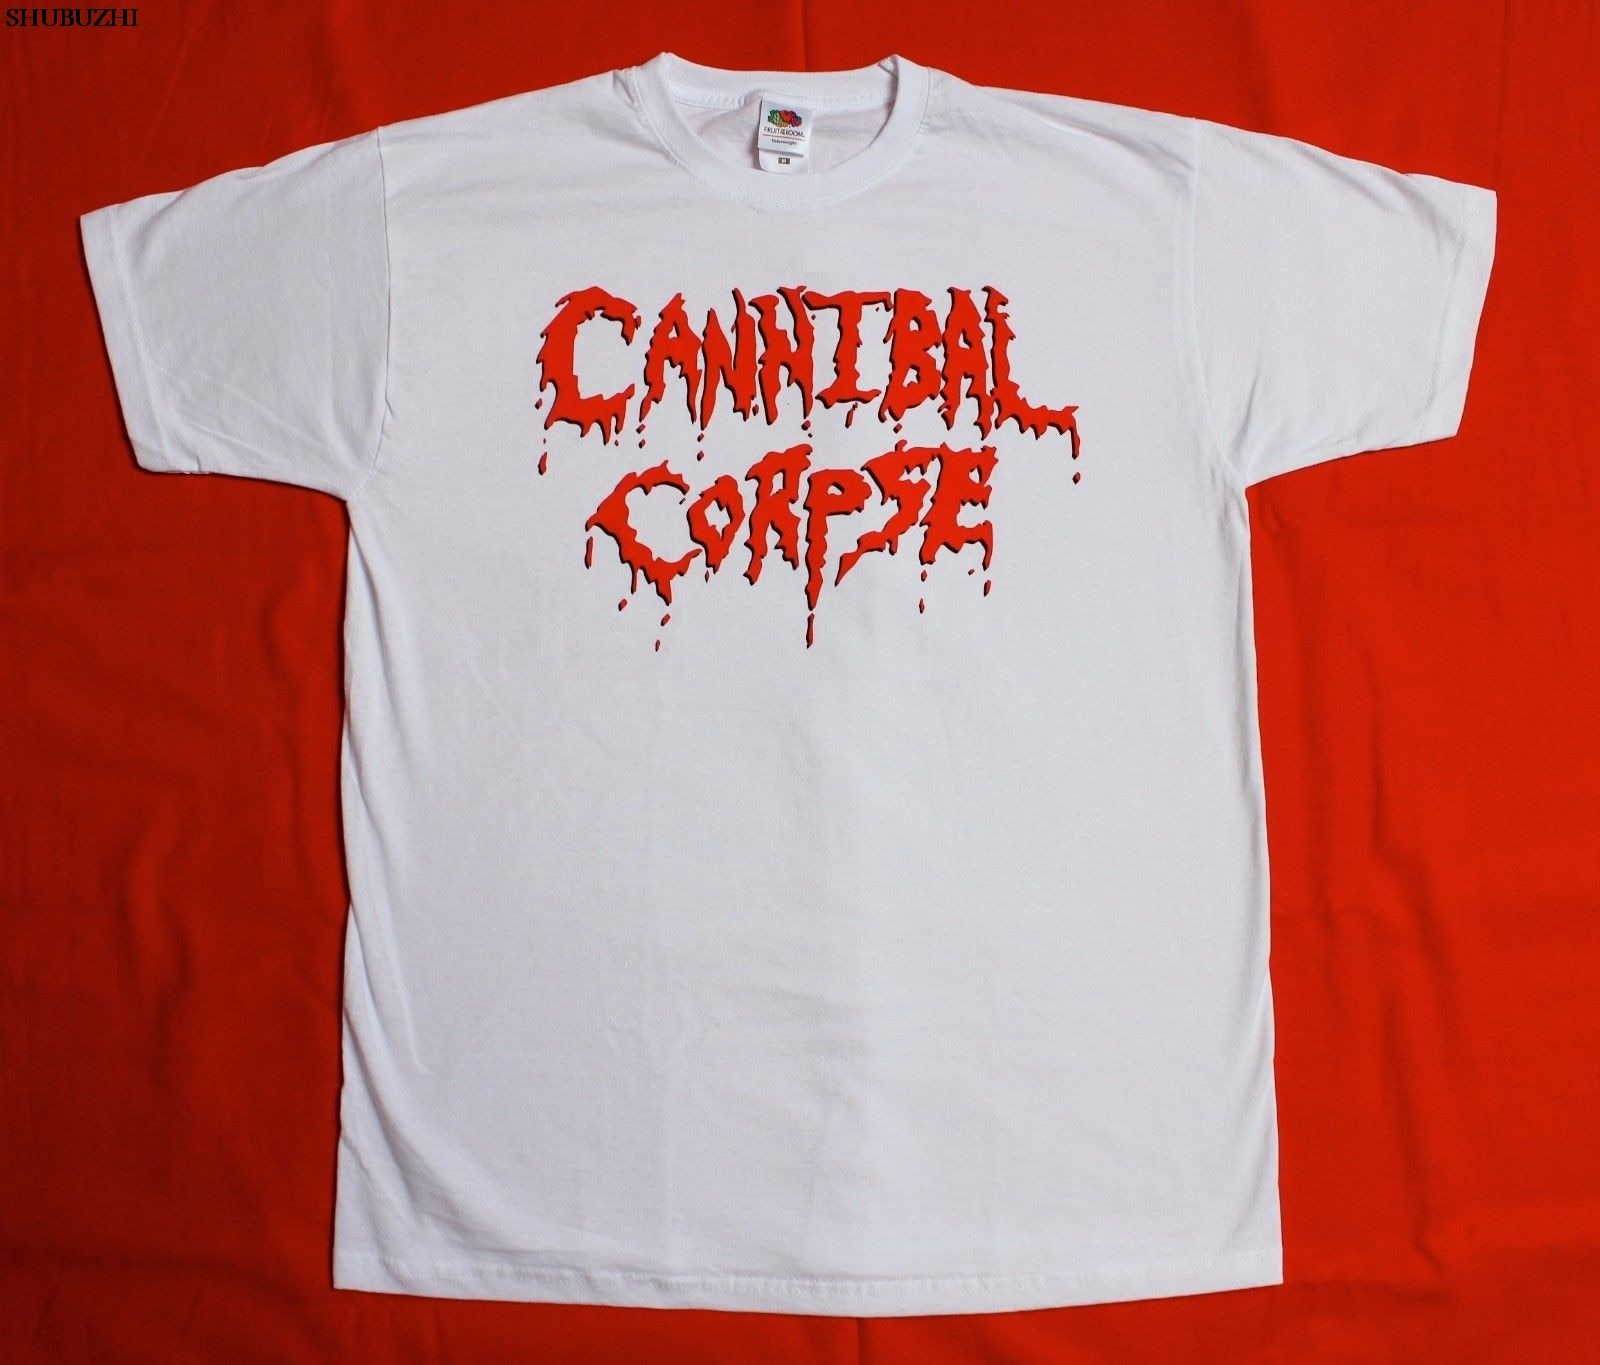 CANNIBAL CORPSE LOGO DEATH METAL GRINDCORE CHRIS barns nueva camiseta blanca estampada Camiseta estilo de verano camiseta superior